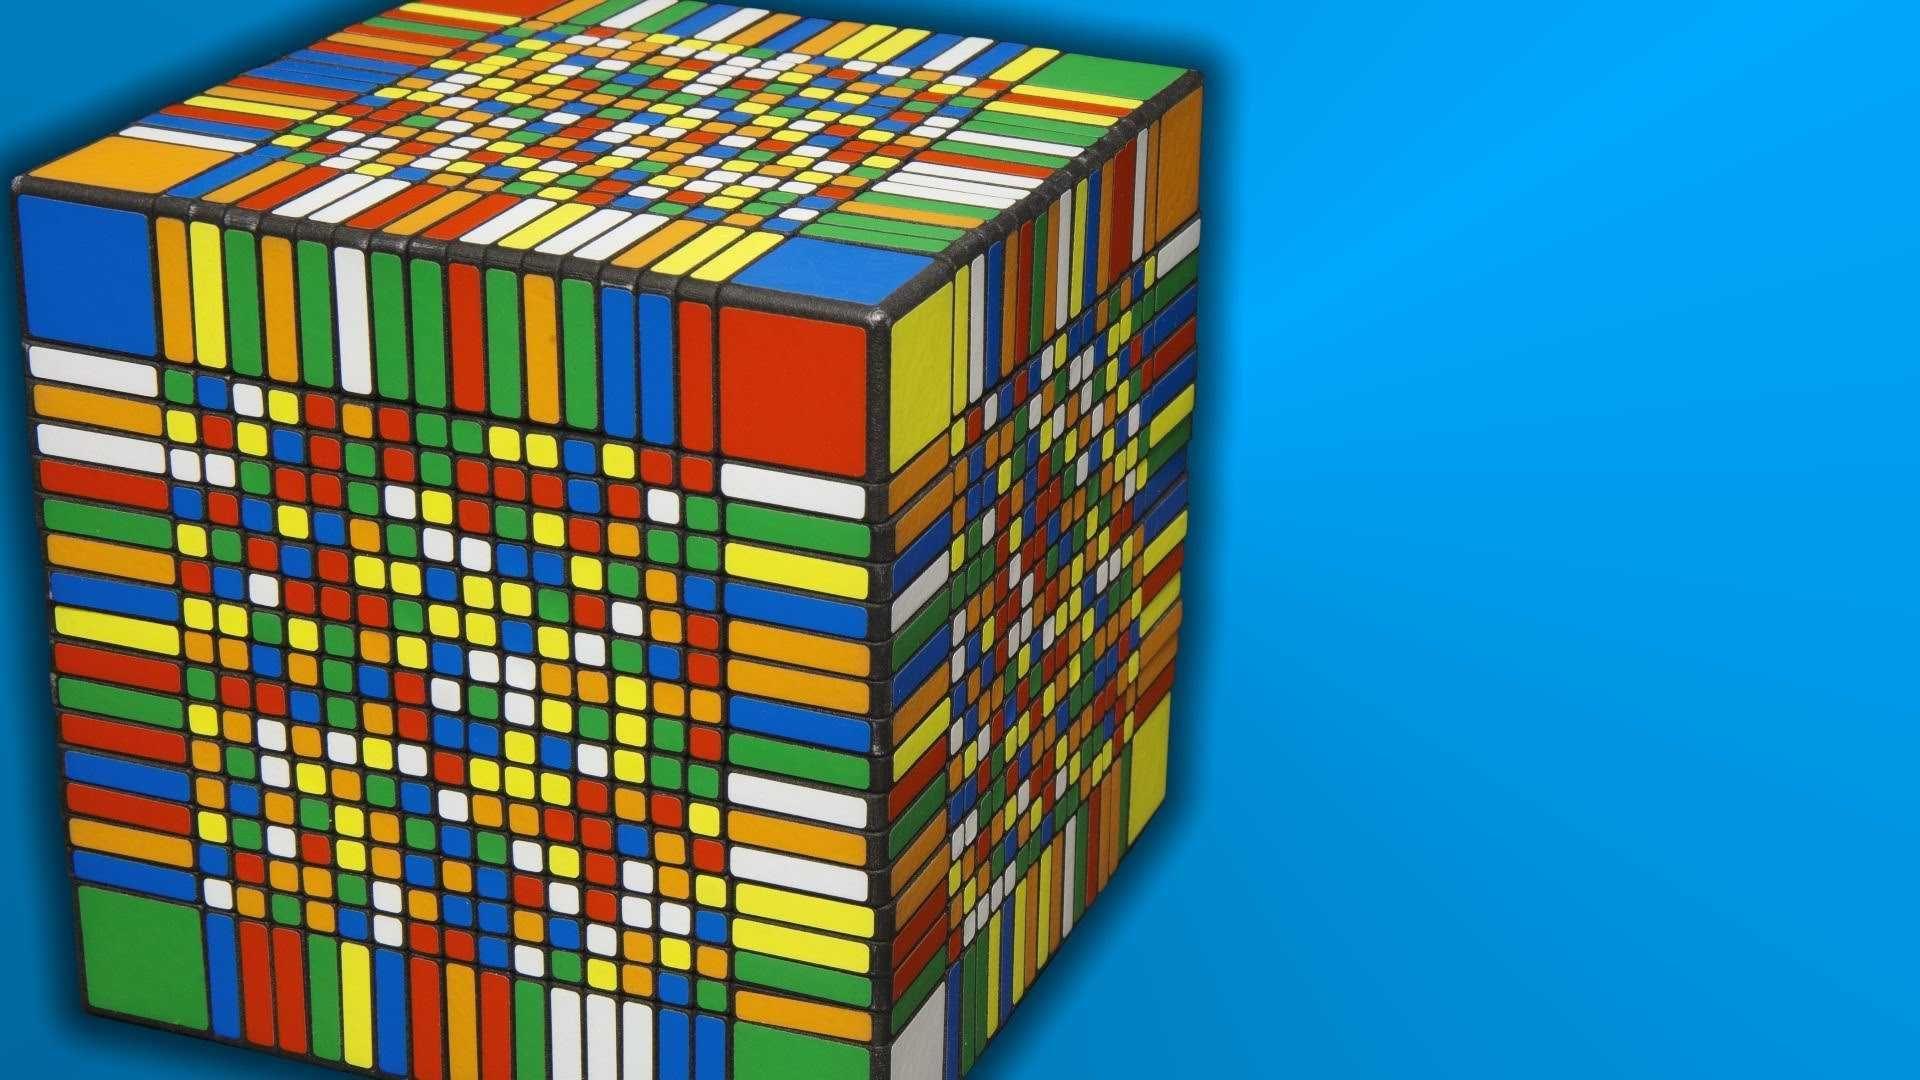 Rubiks Cube Desktop Wallpaper